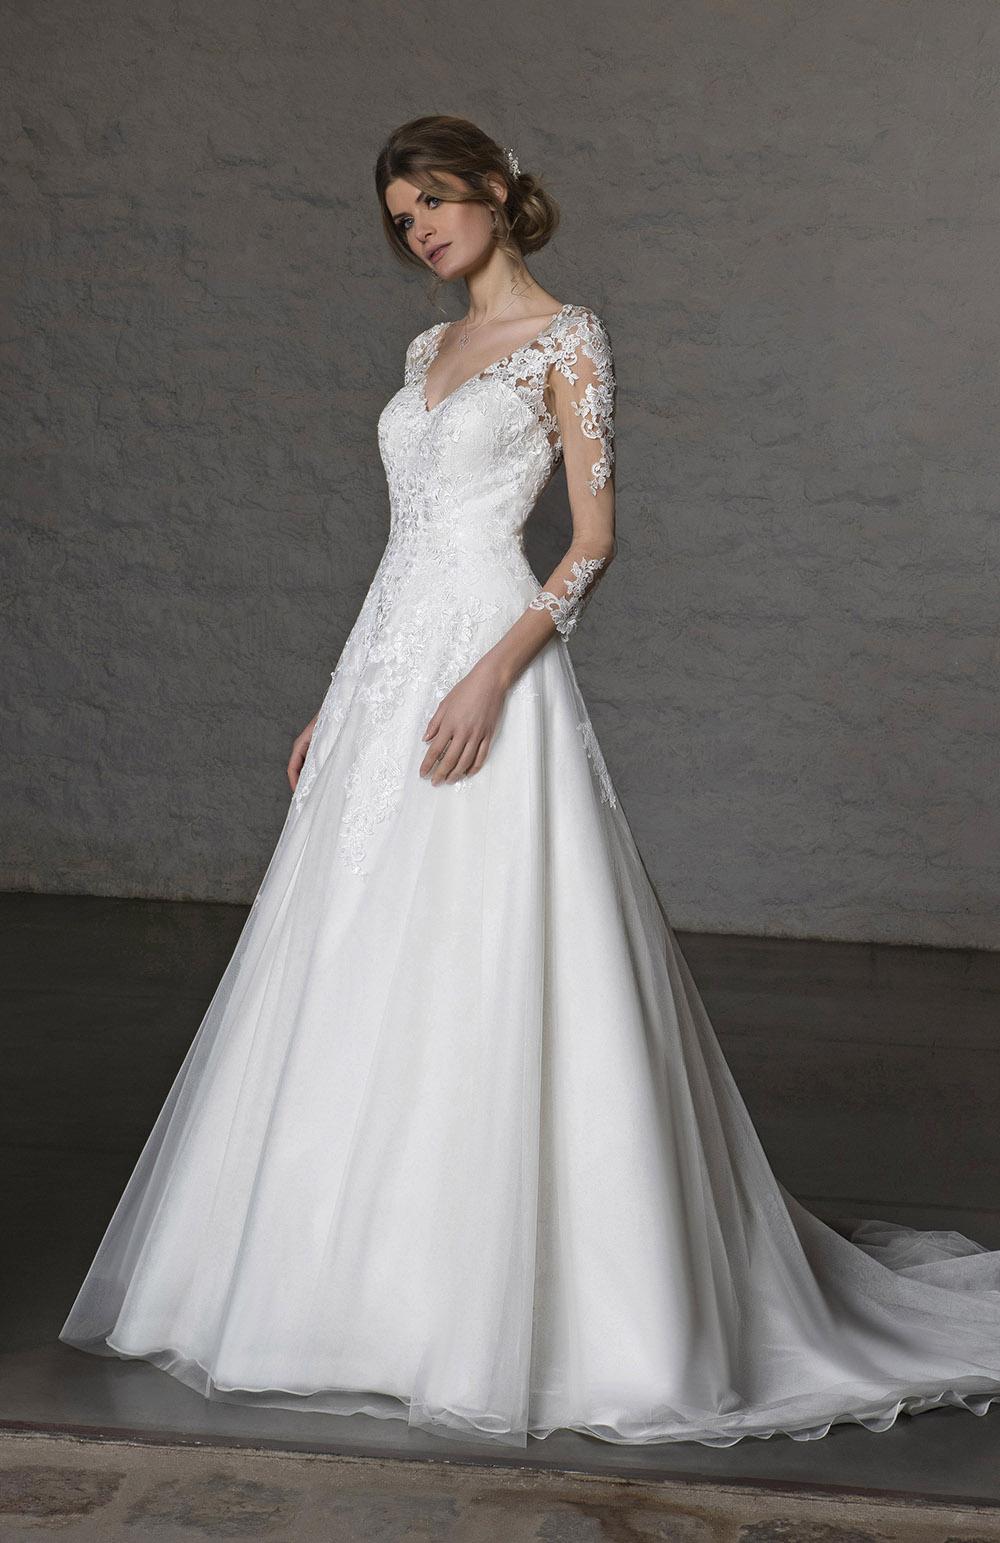 Robe de mariée Modèle Chenda